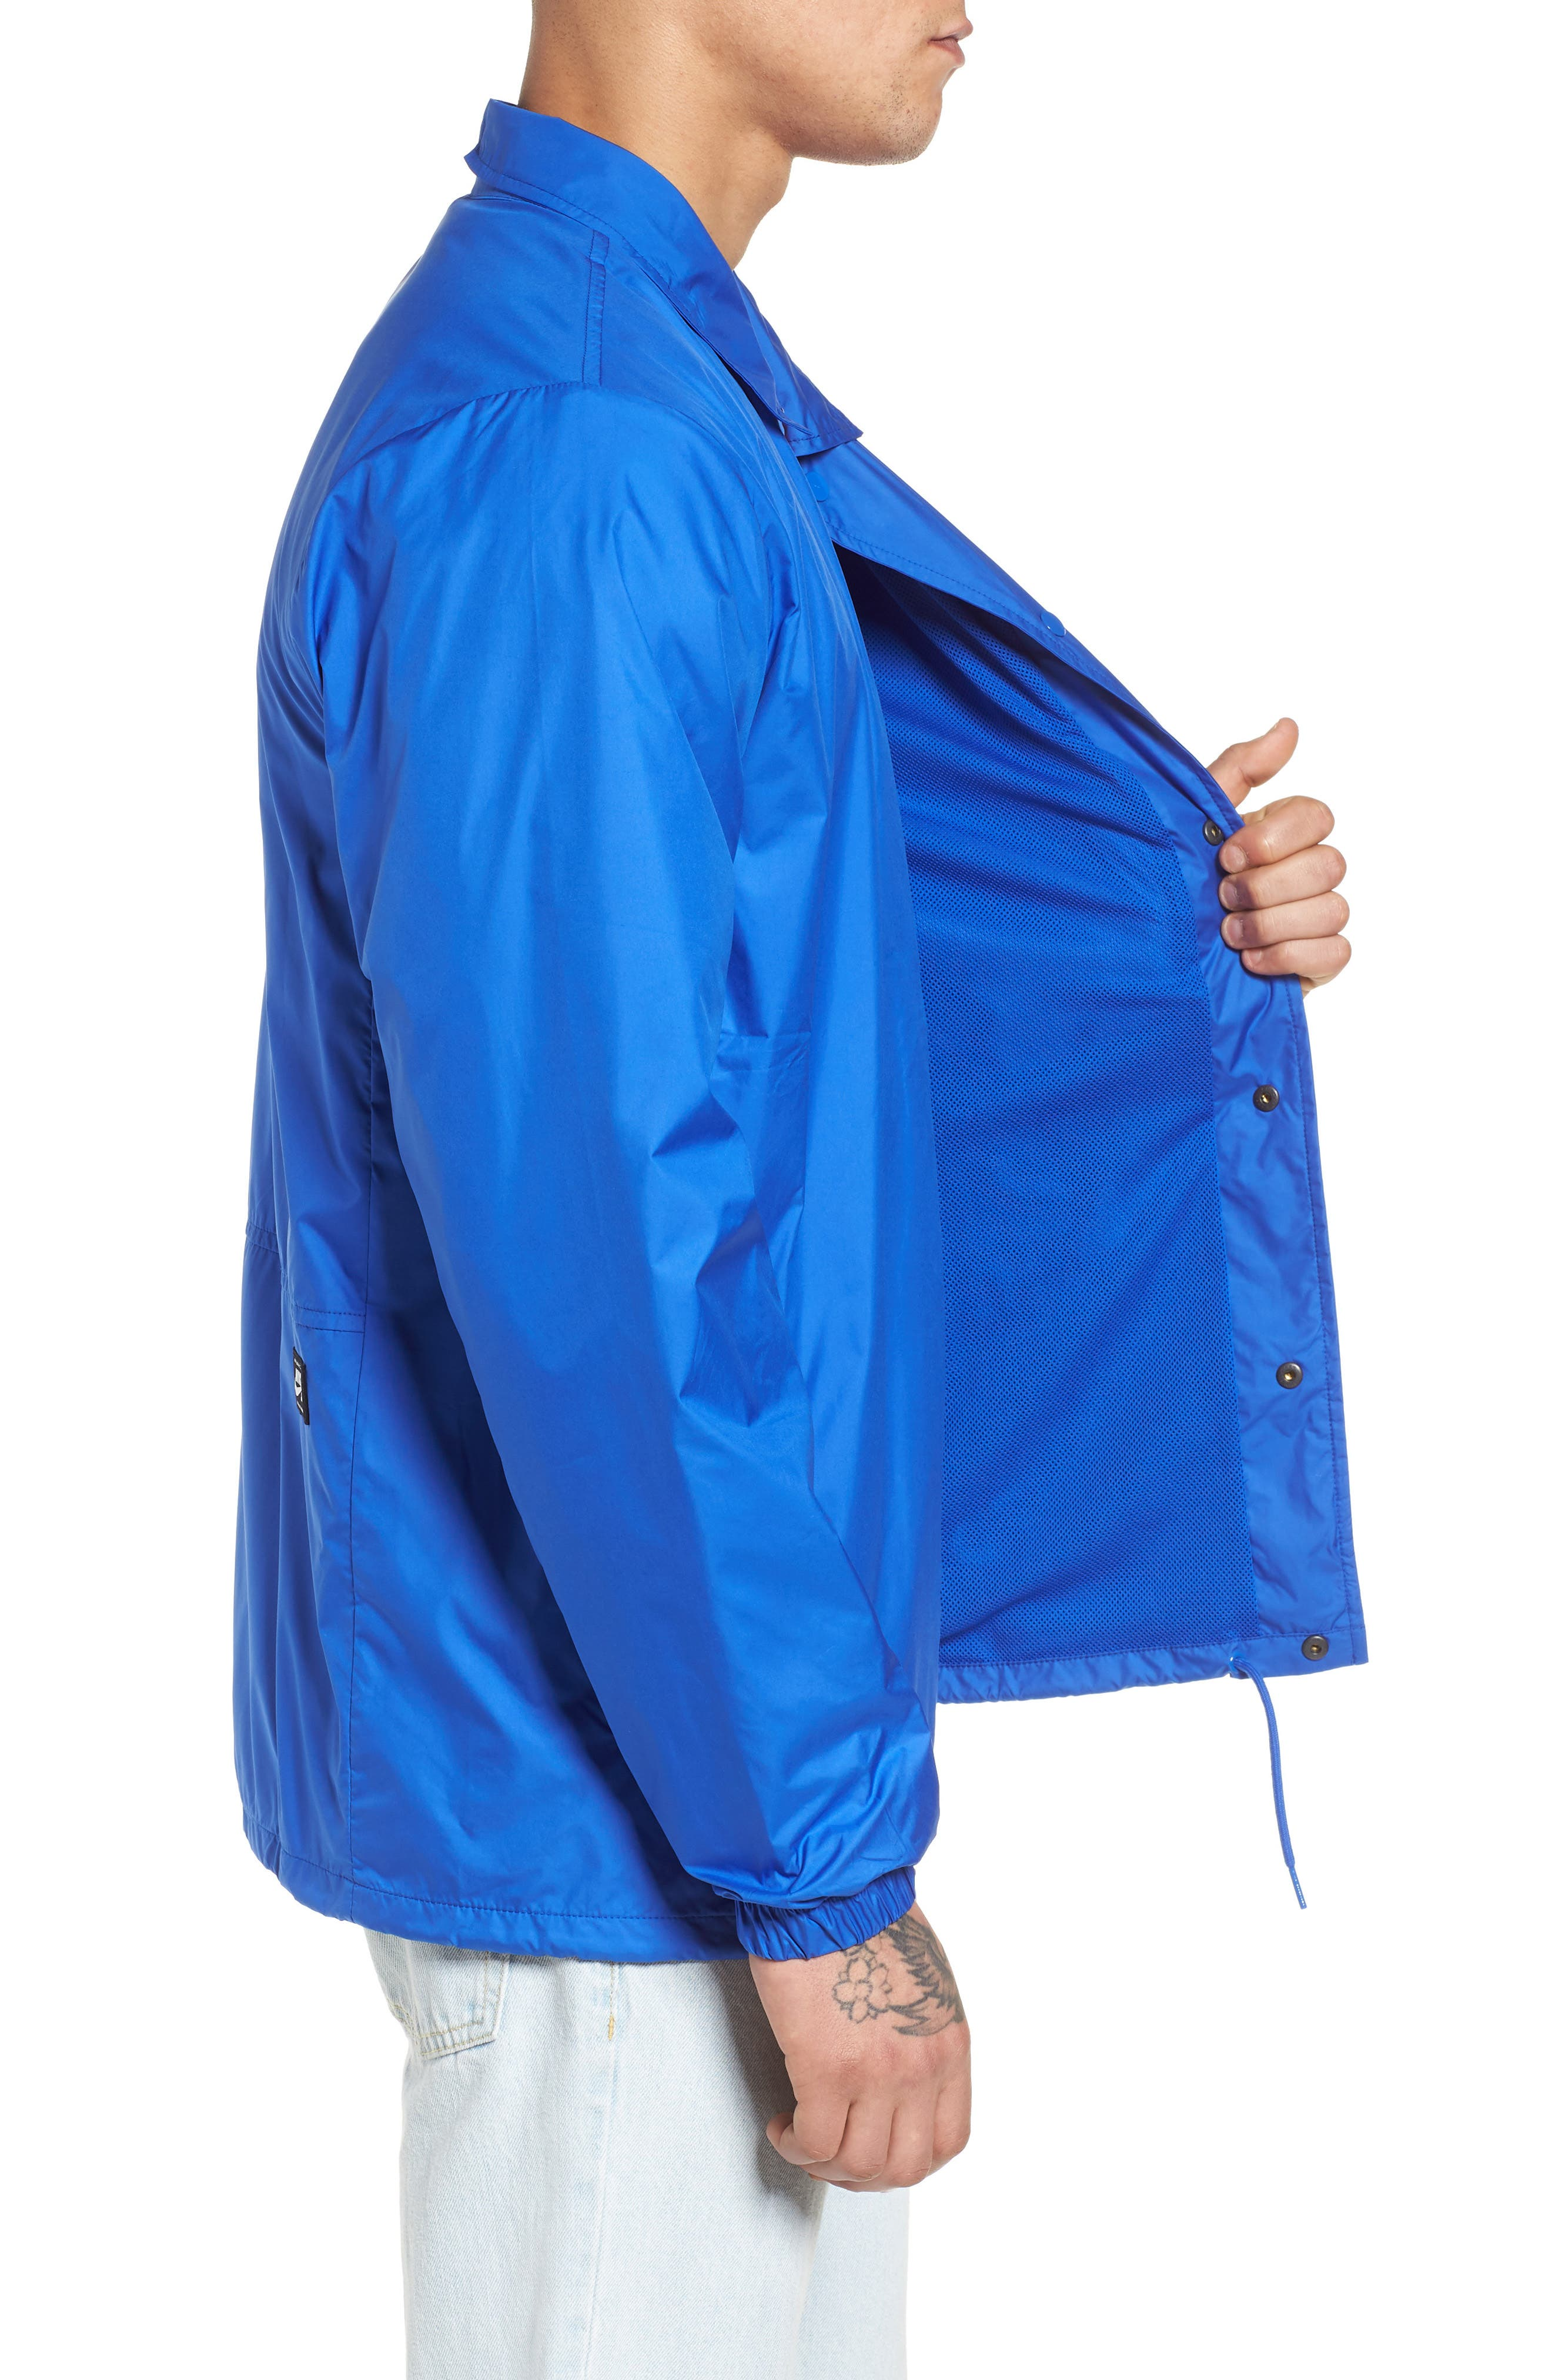 SB Shield Coach's Jacket,                             Alternate thumbnail 3, color,                             HYPER ROYAL/ WHITE